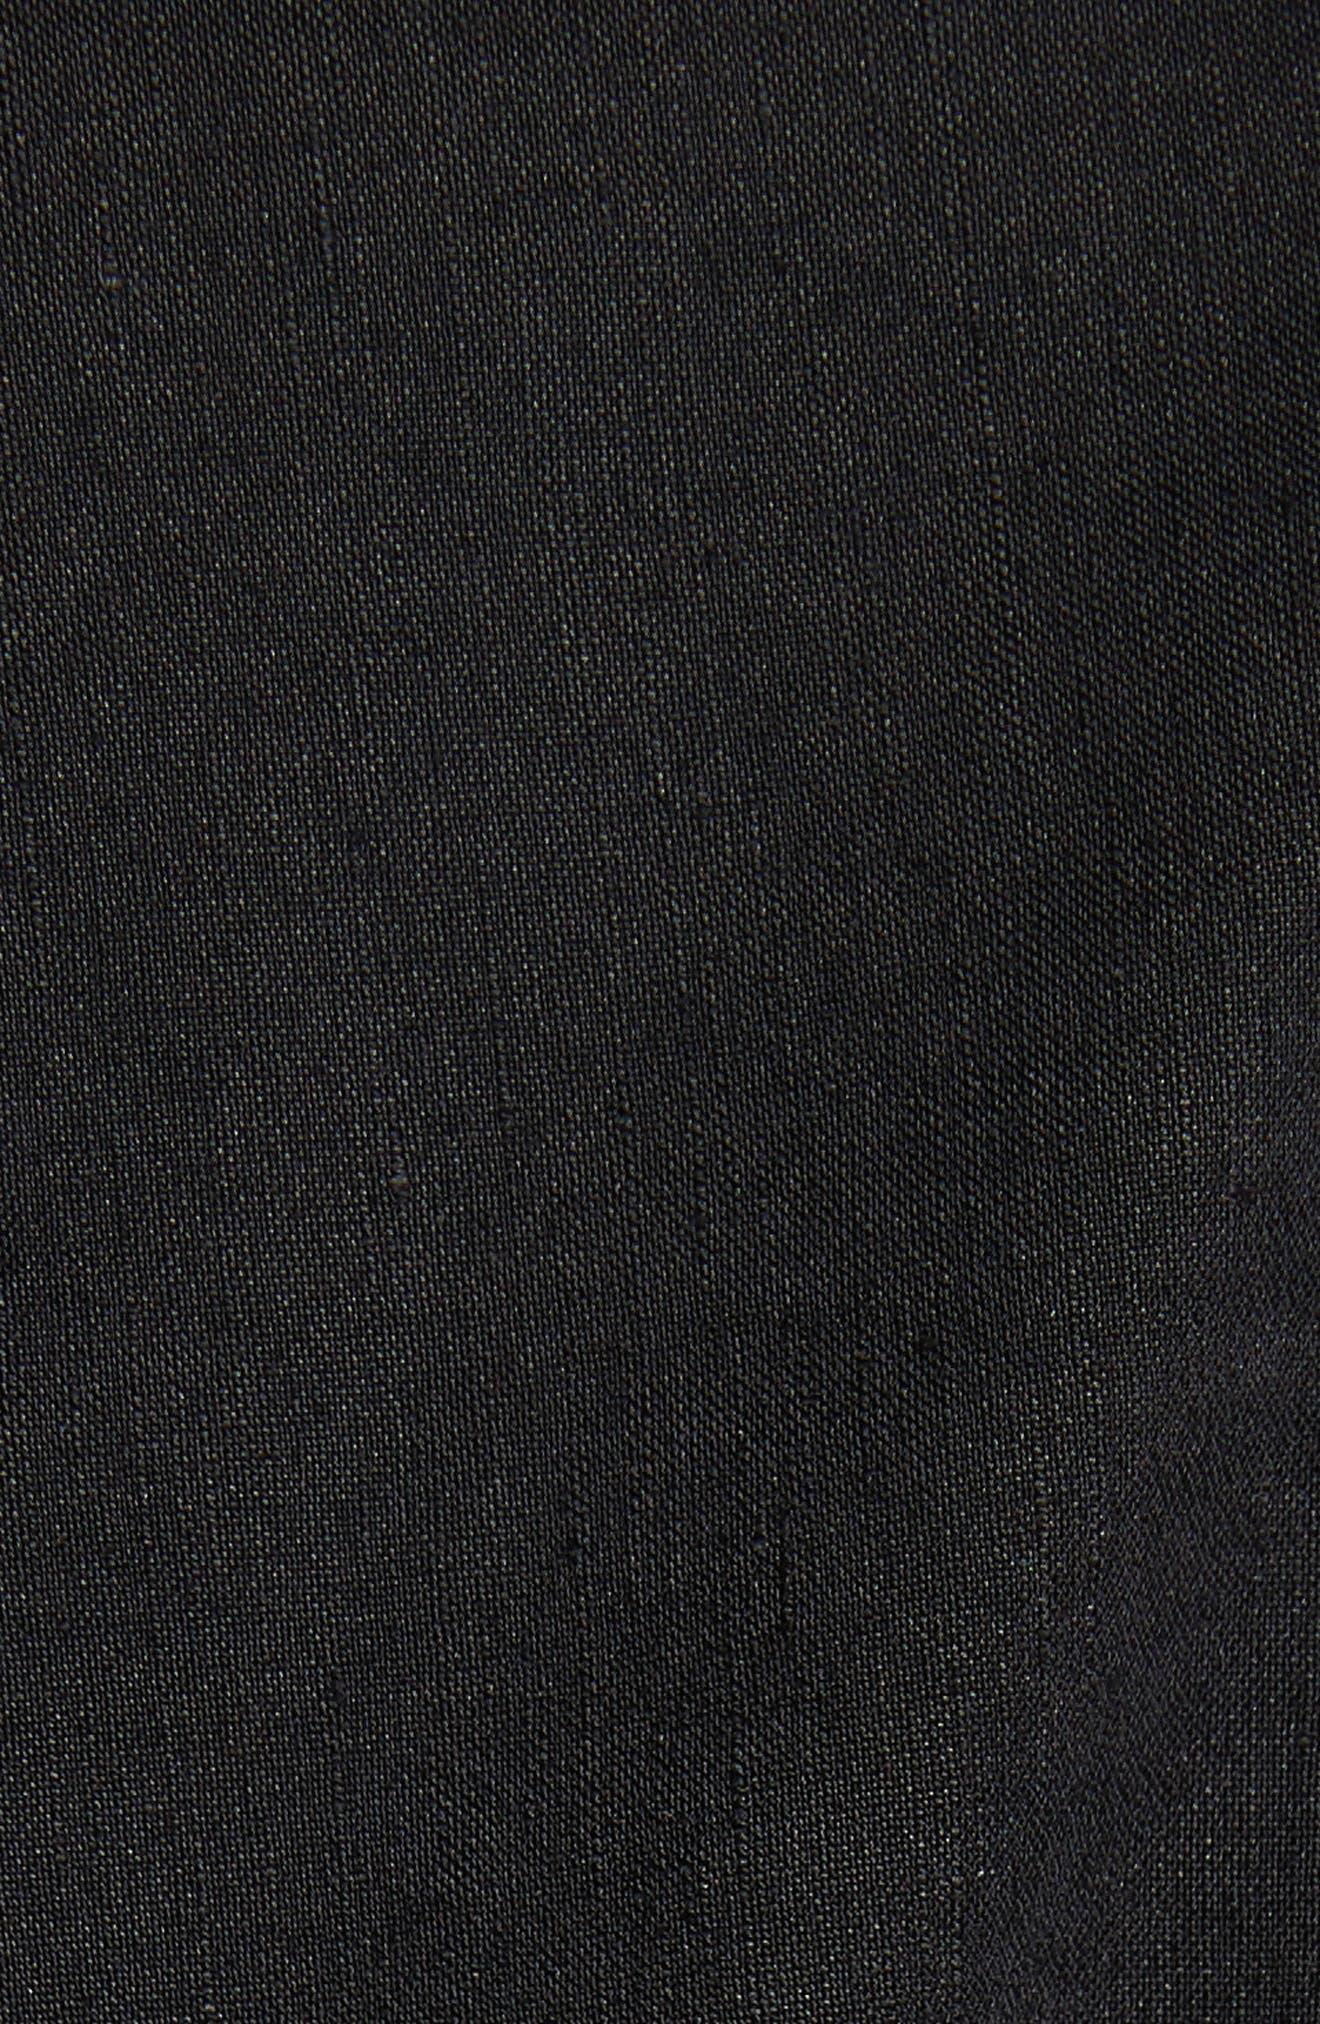 Belted Shift Dress,                             Alternate thumbnail 5, color,                             Black Multi